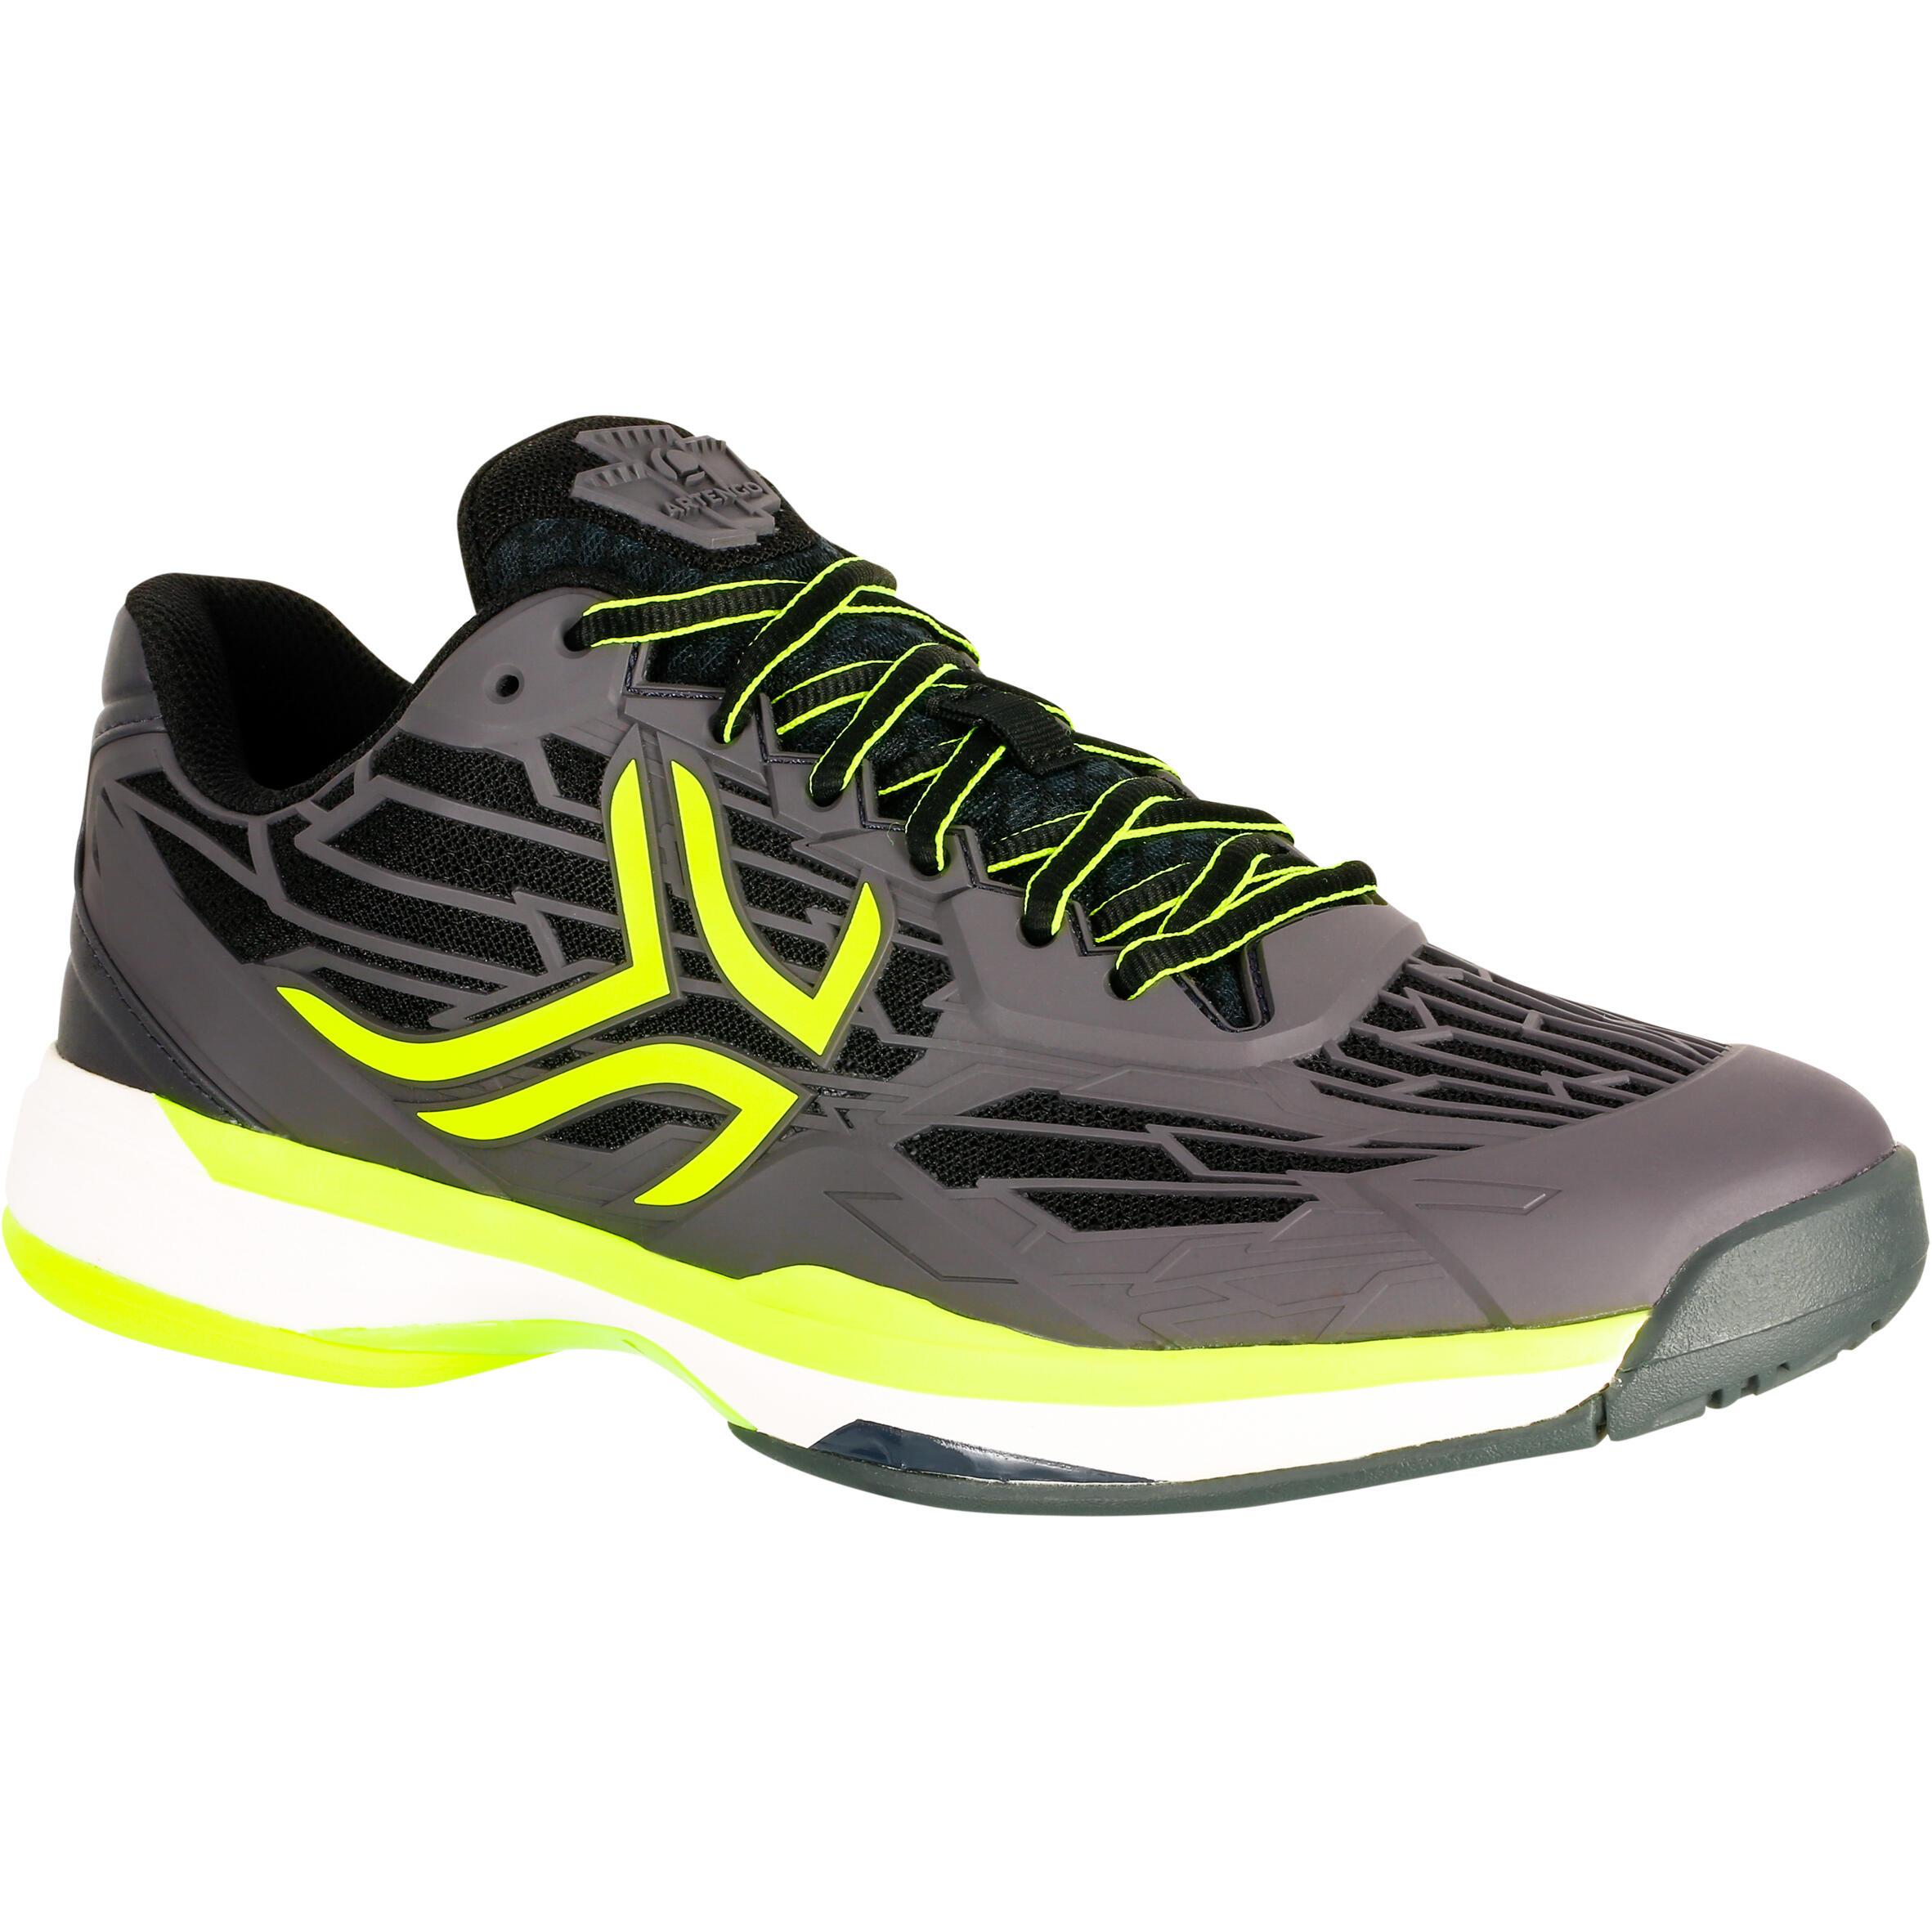 Chaussures de tennis homme ts990 noir jaune terre battue artengo